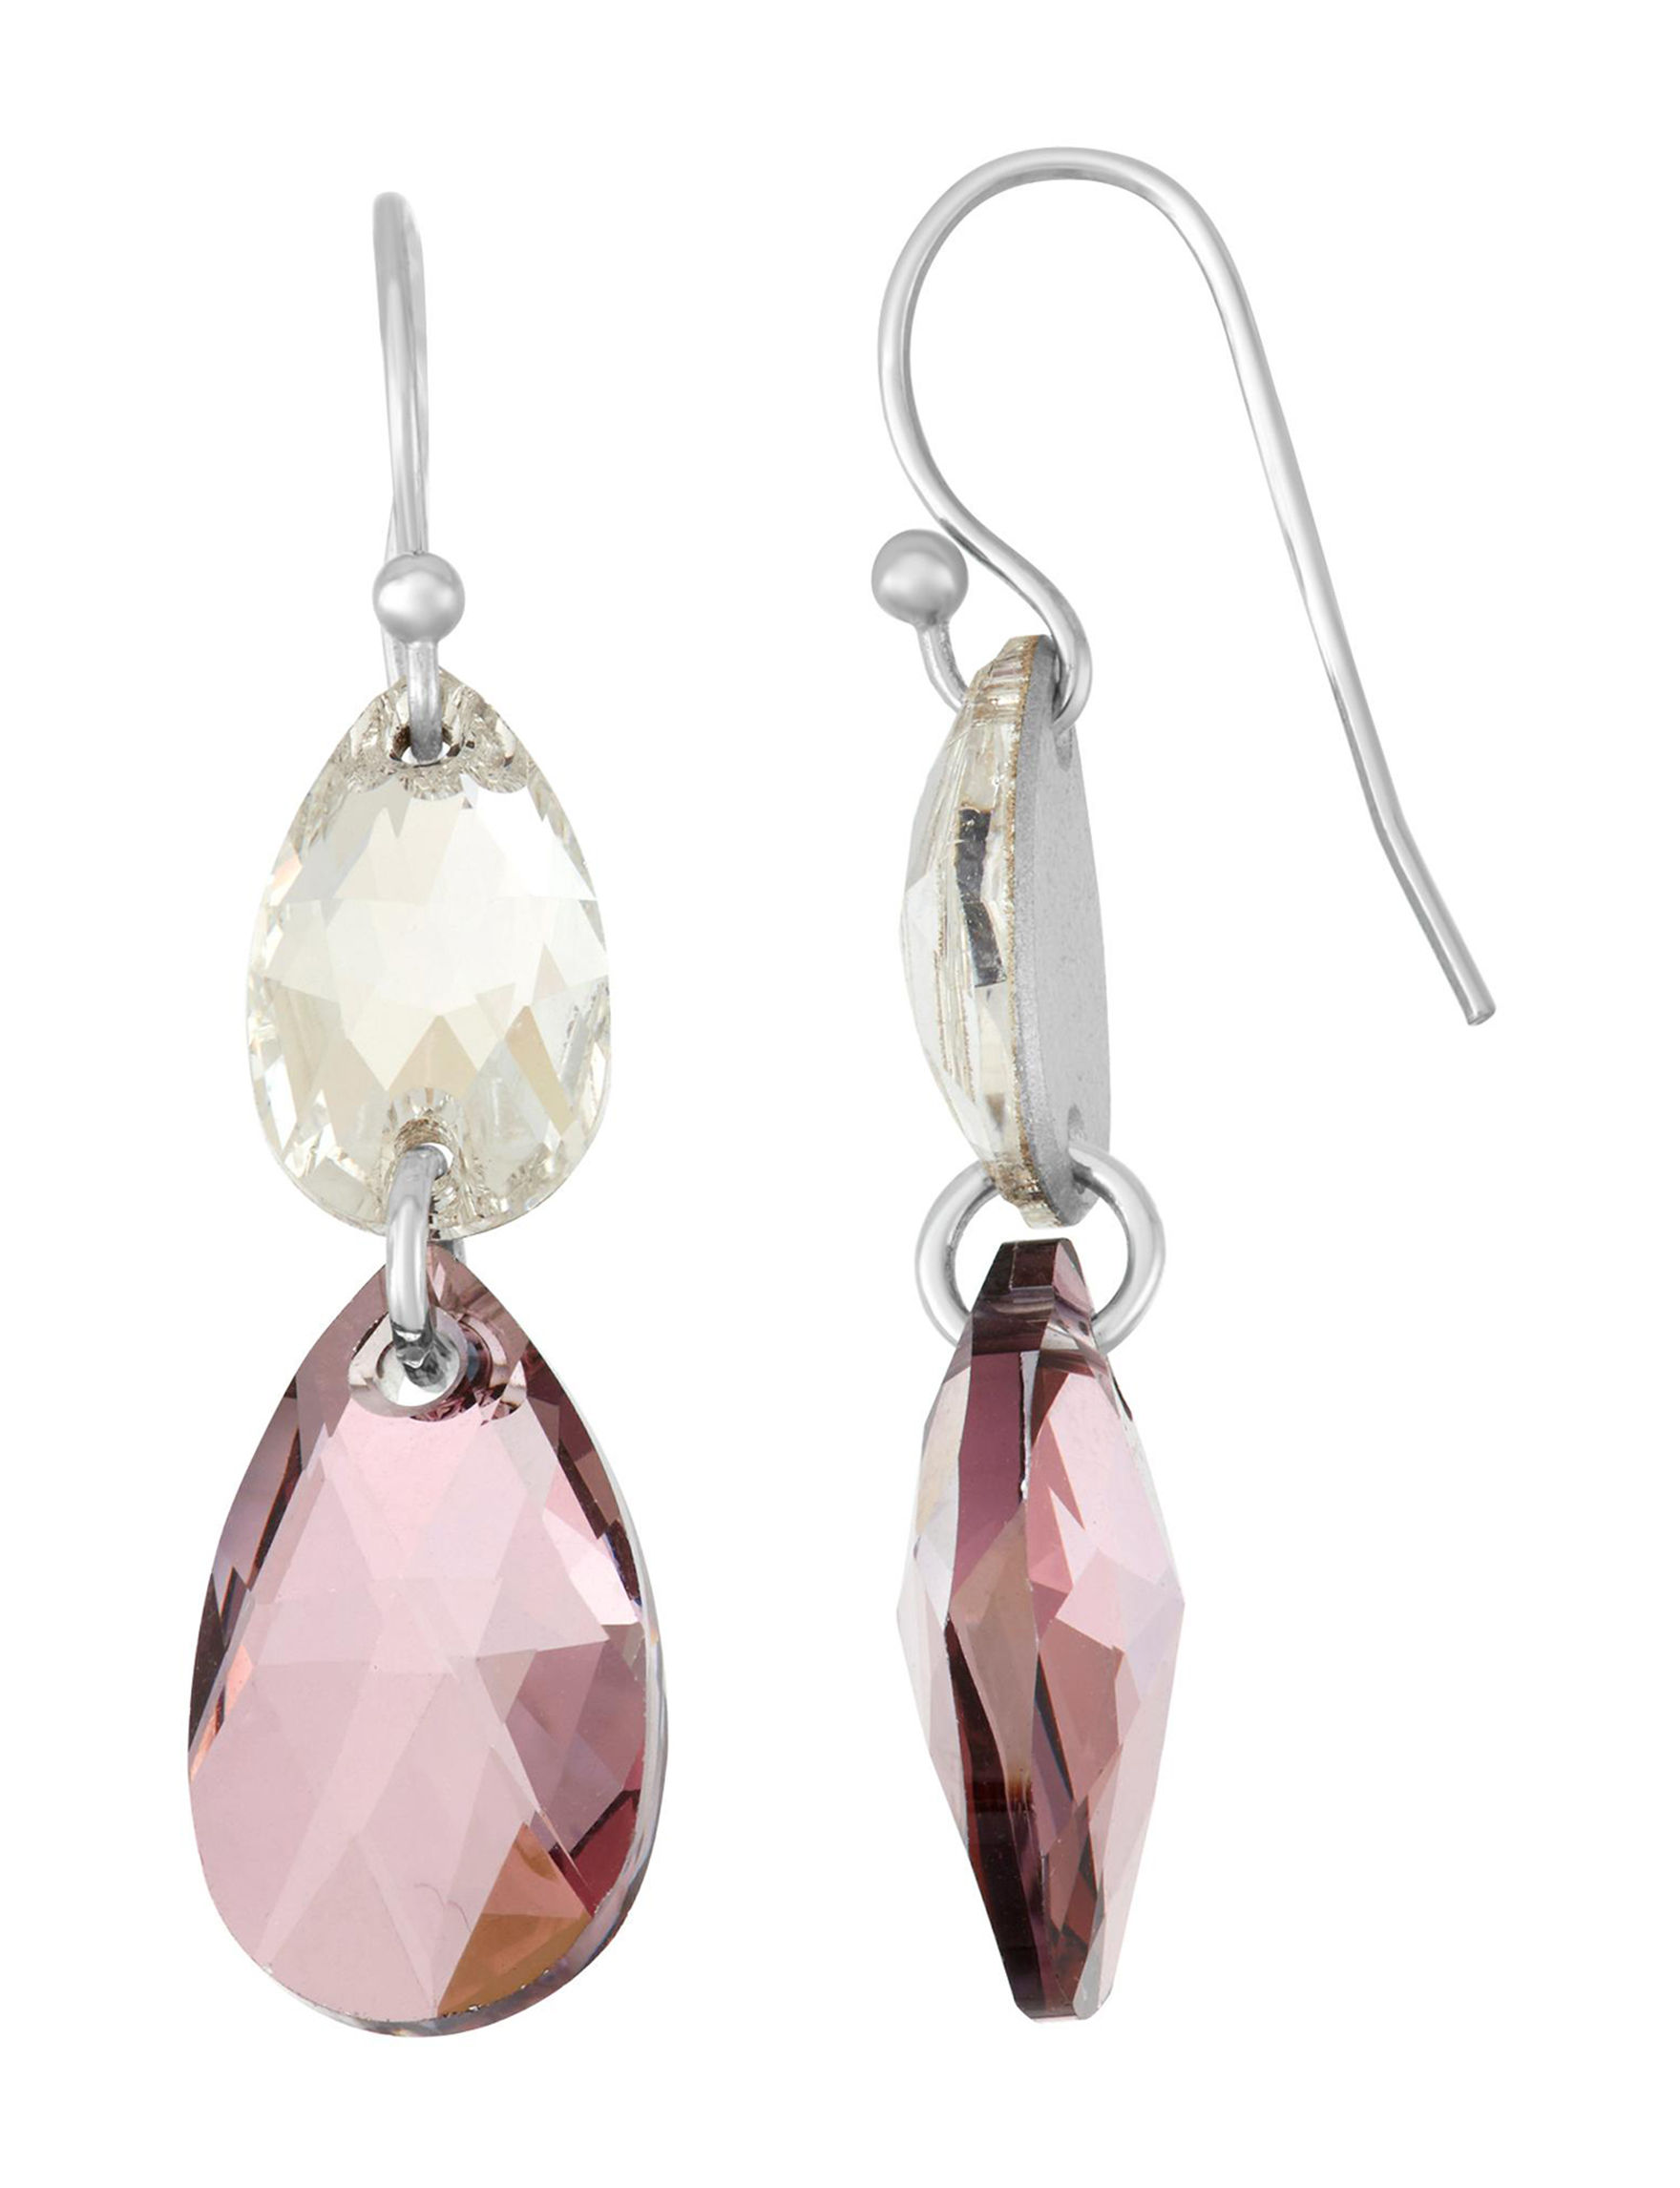 Chroma Silver / Pink Drops Earrings Fine Jewelry